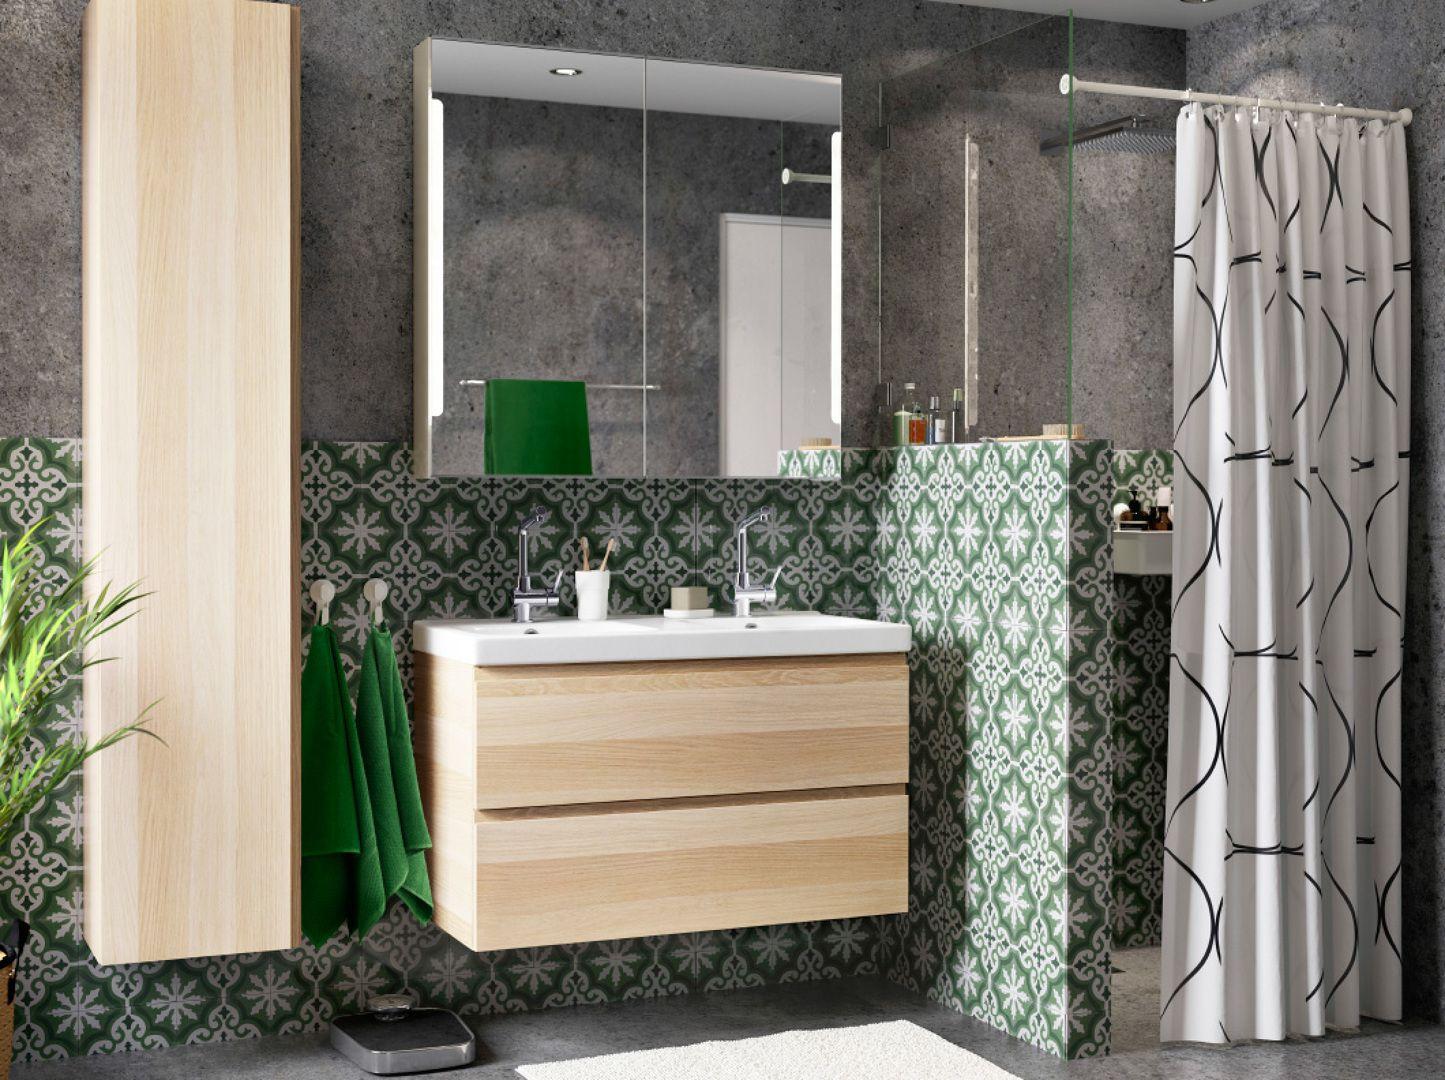 Mueble auxiliar a decoraci n home living arquitectura ba os ba o ikea y decoracion de ba os Ikea mueble auxiliar bano